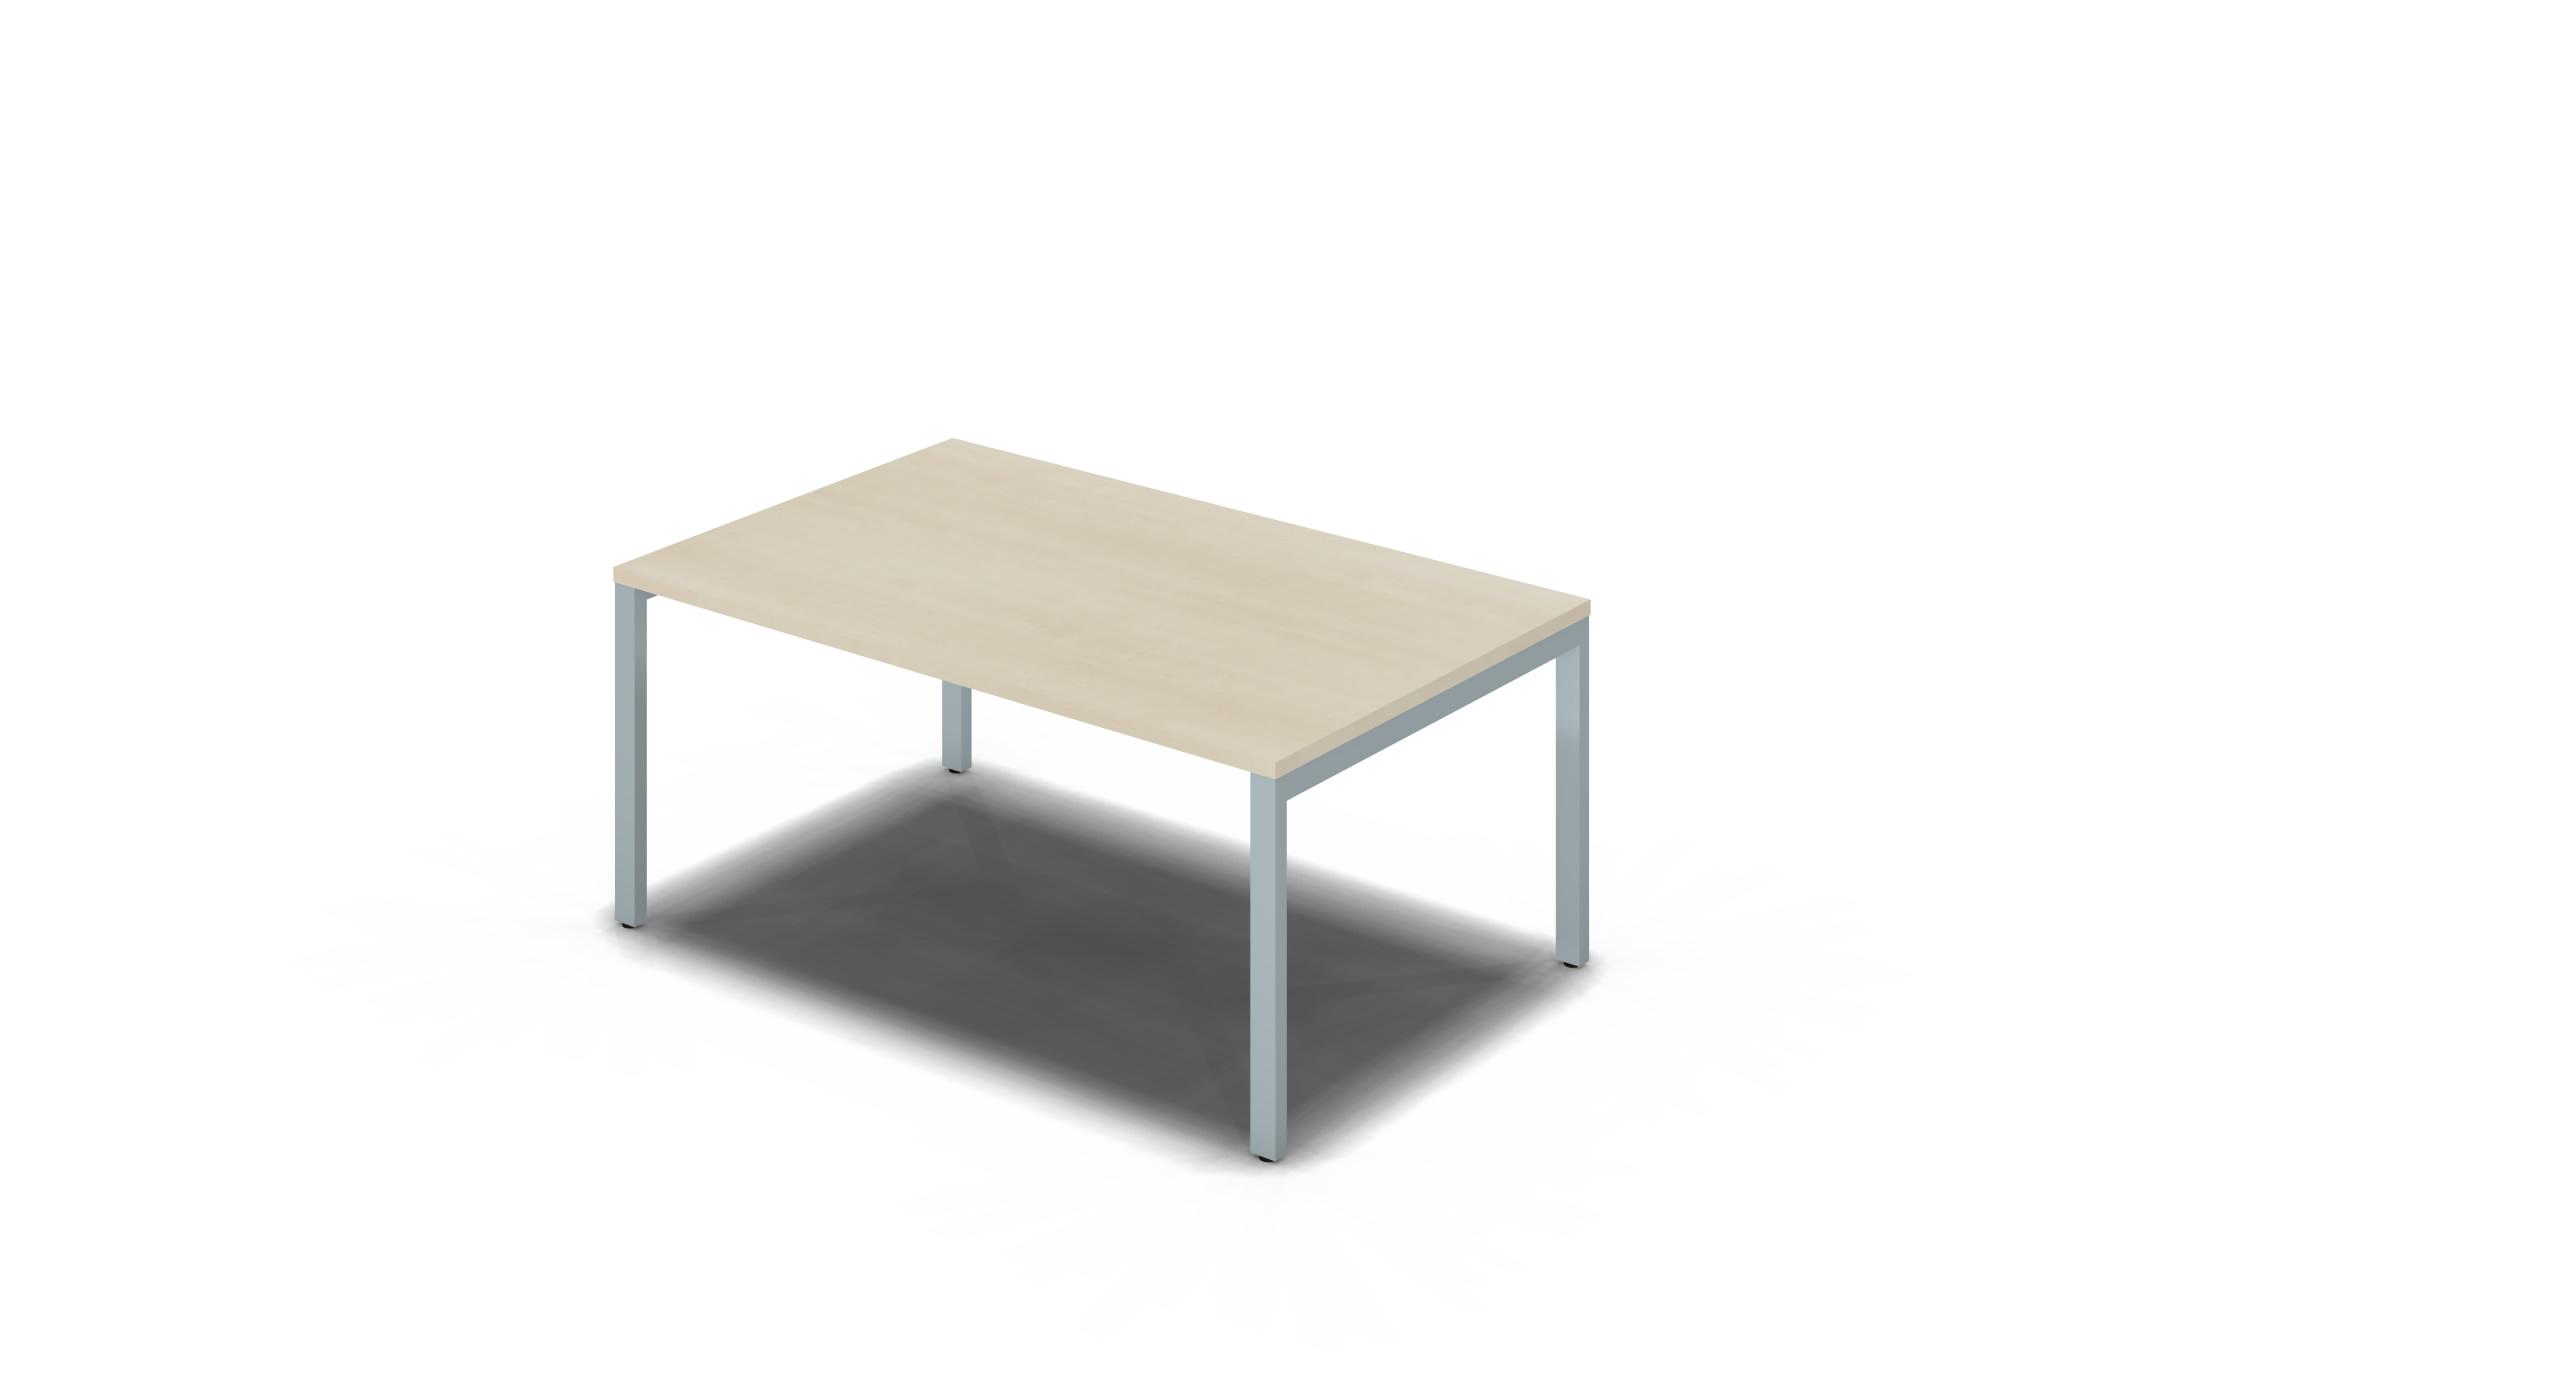 Table_Square_1500x900_Silver_Maple_noOption